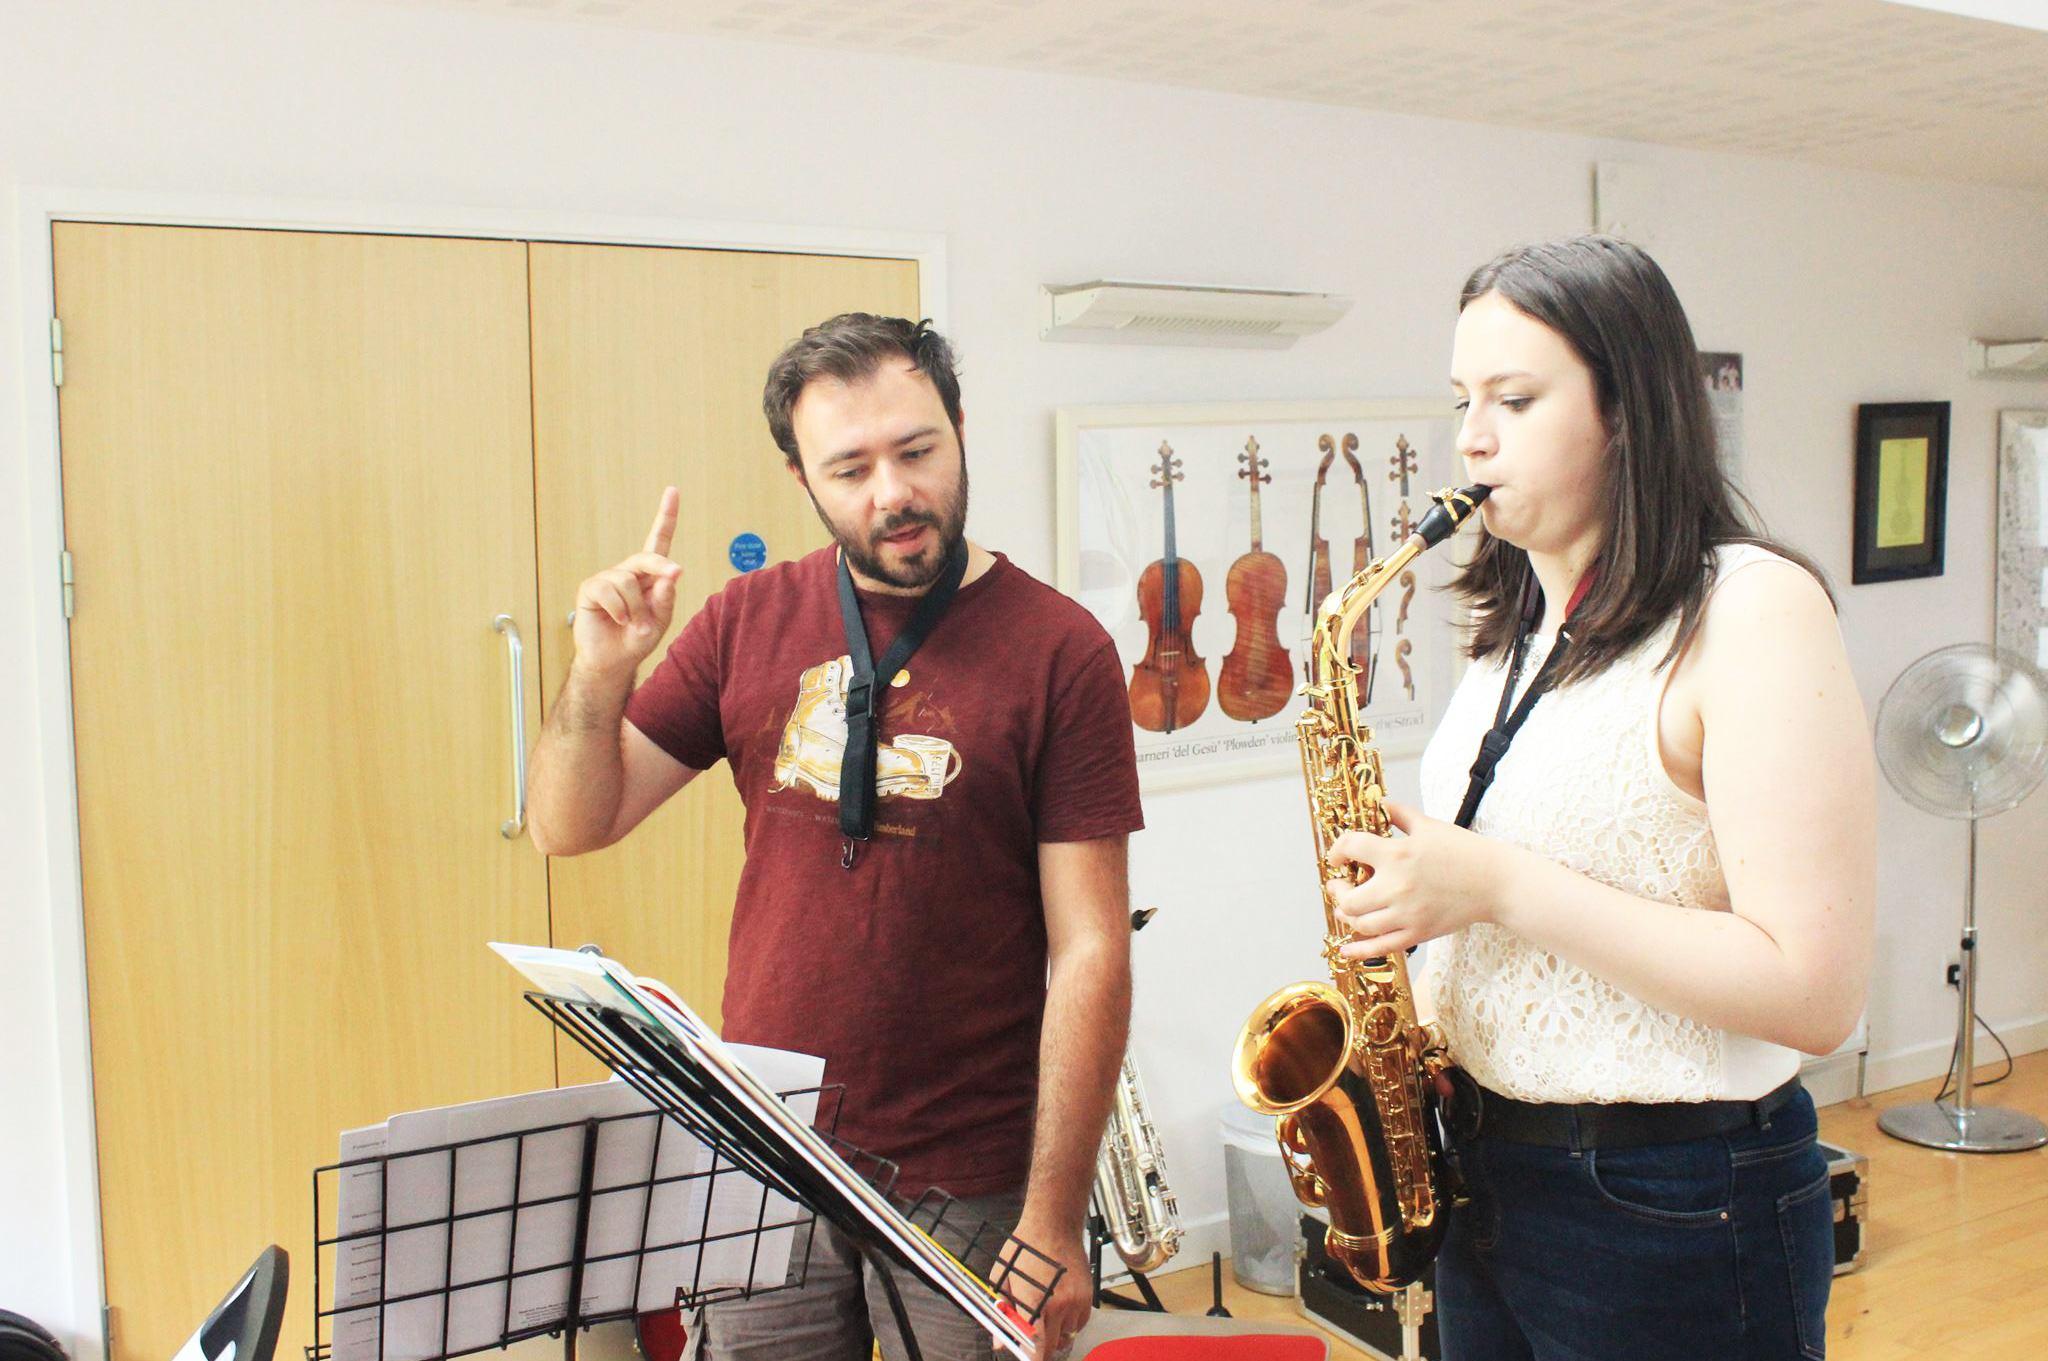 Dominic Childs, Saxophone tutor at the Ingenium Academy